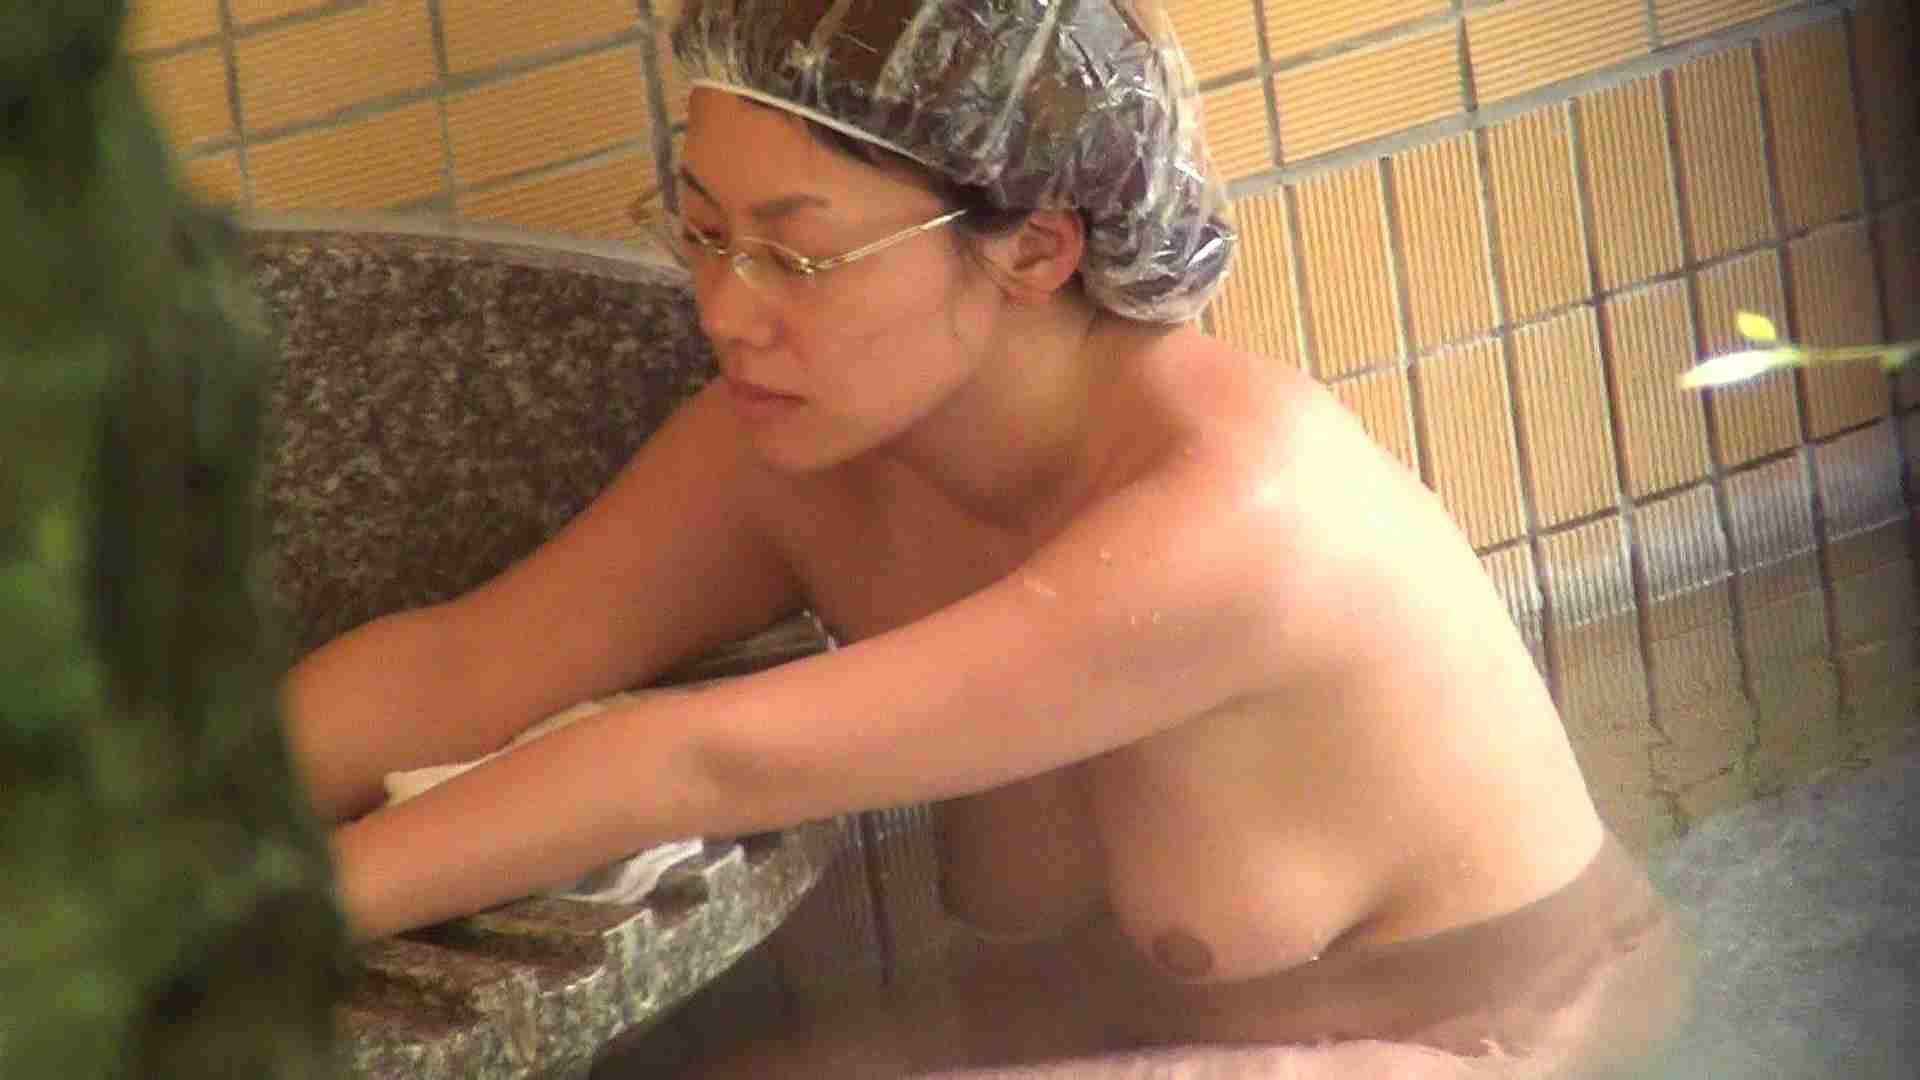 Aquaな露天風呂Vol.280 OLセックス | 盗撮  91画像 10